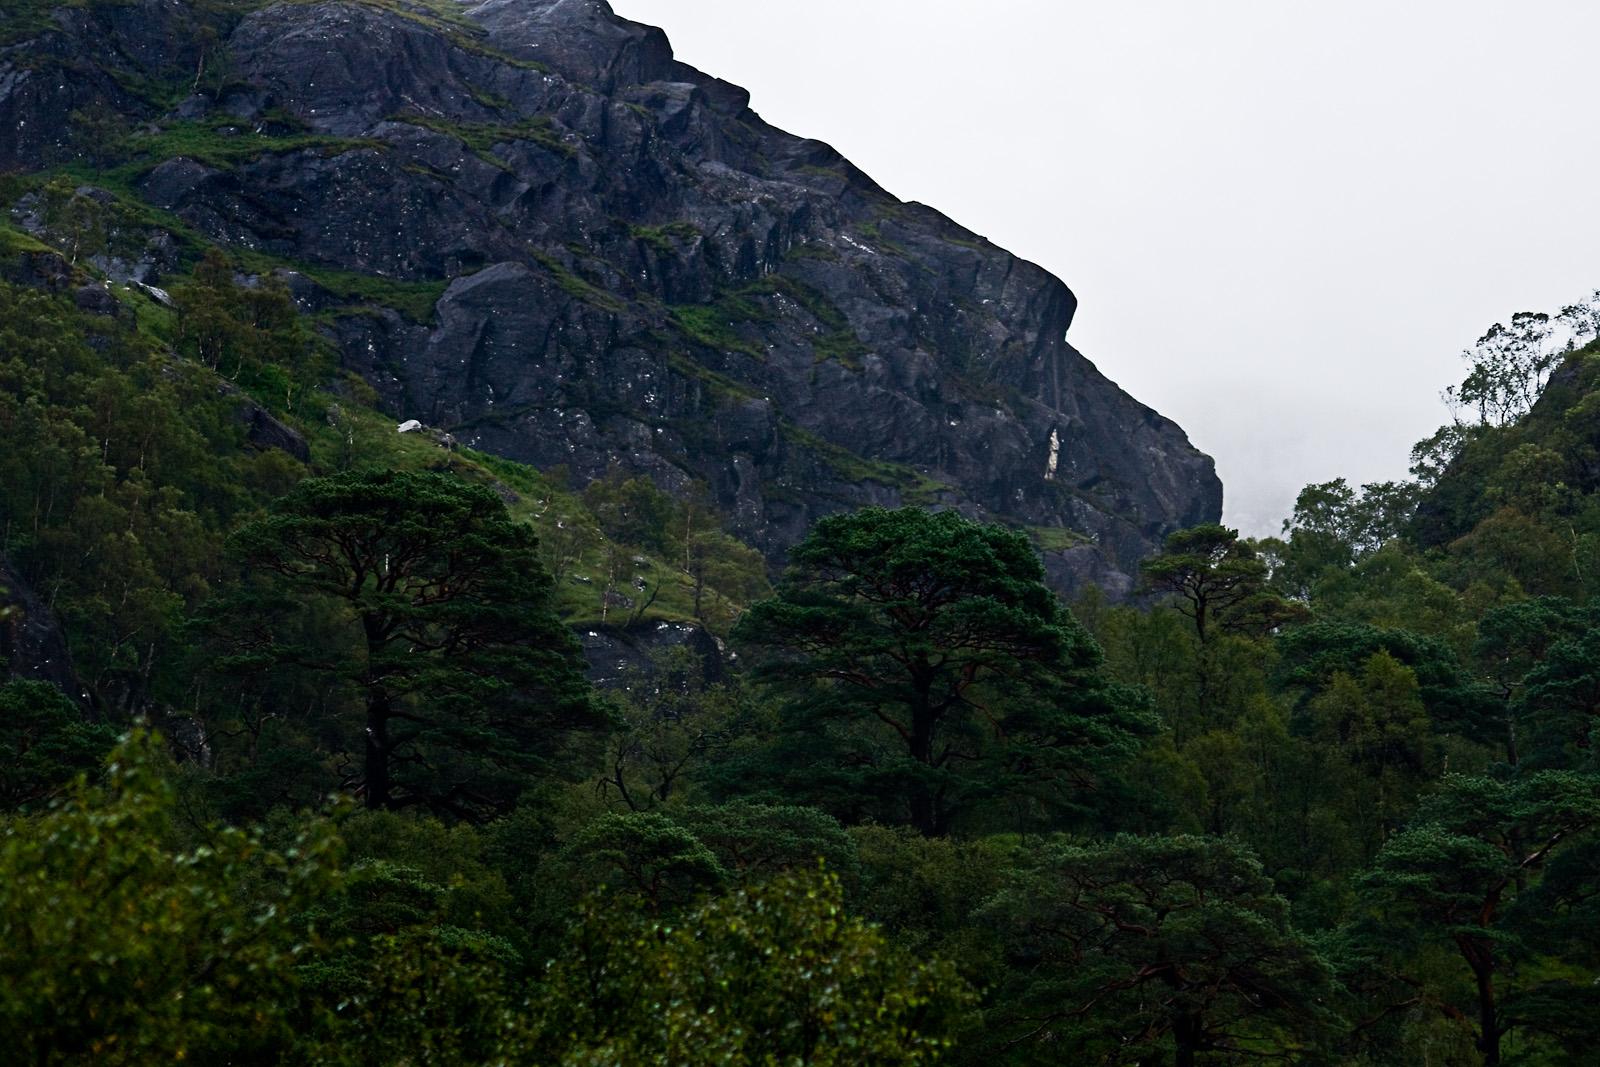 Schottland LV - Glen Nevis